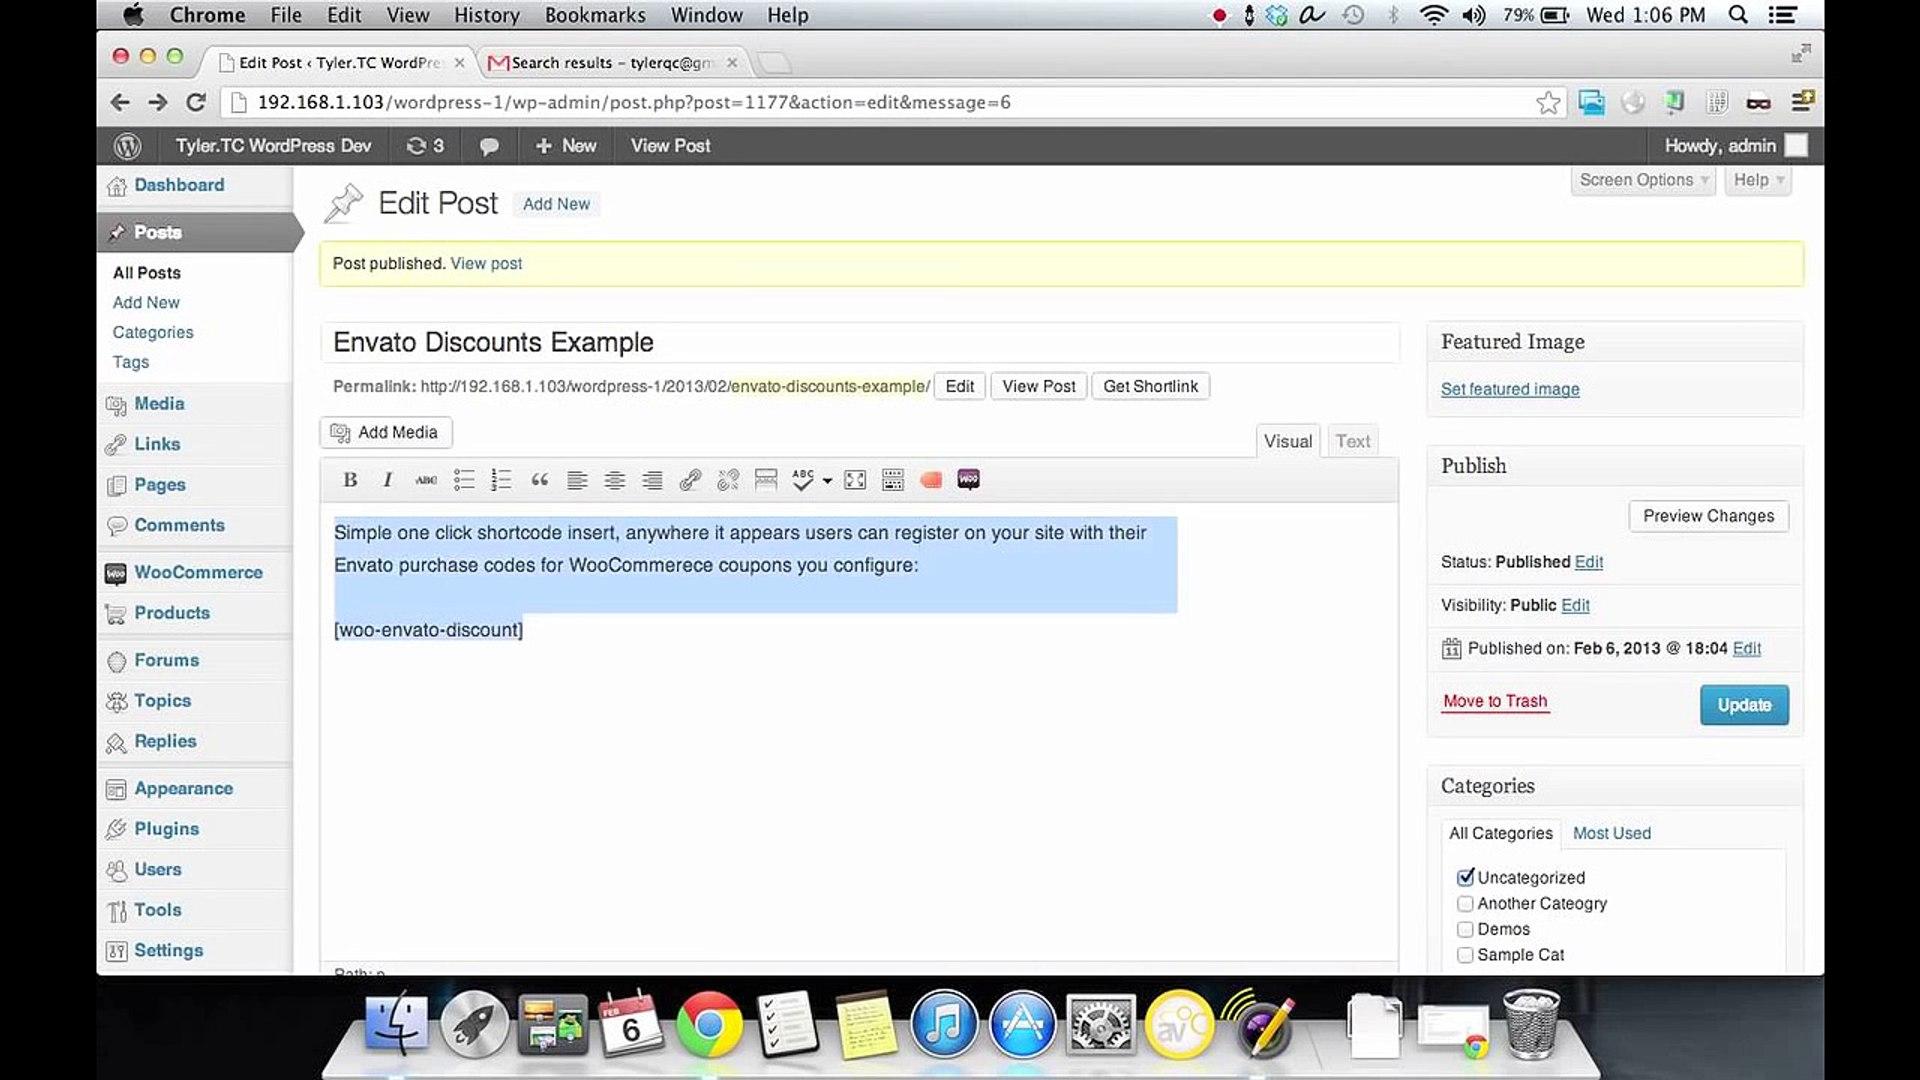 Envato Discount For WooCommerce WordPress